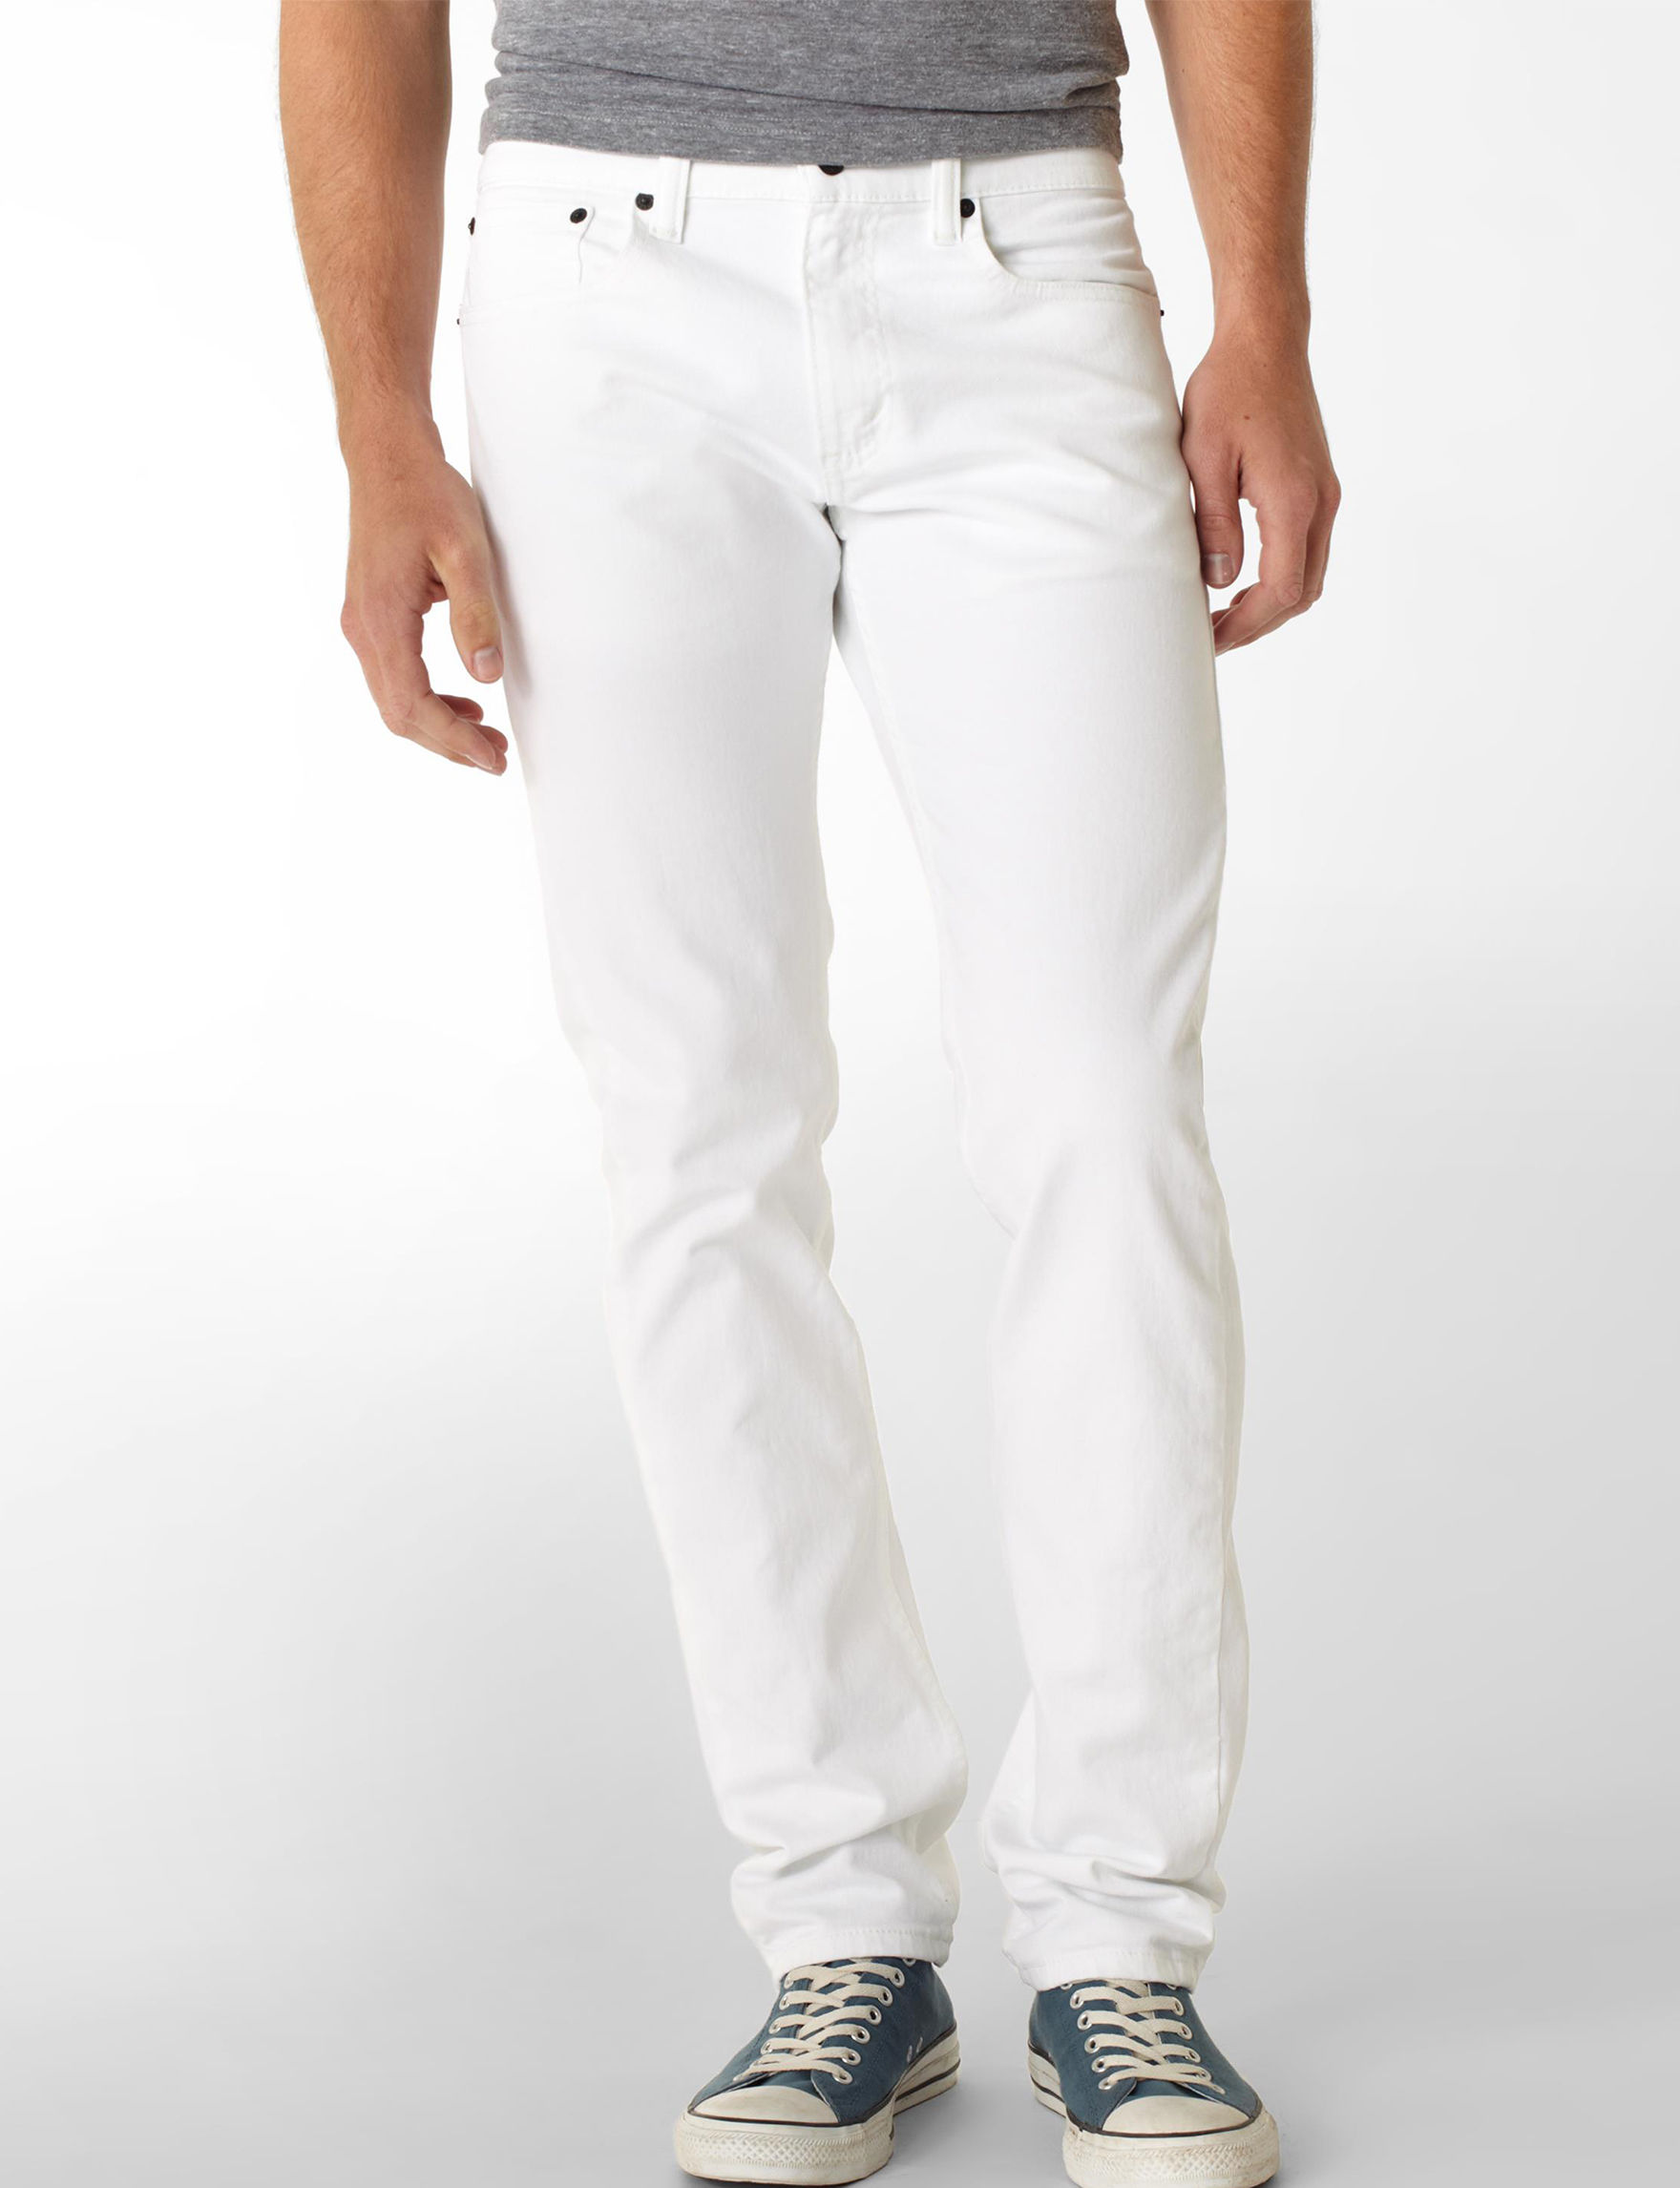 dbbafe82237 ... UPC 039307085175 product image for Levi's White Bull Denim Jeans -  Young Men's - White -